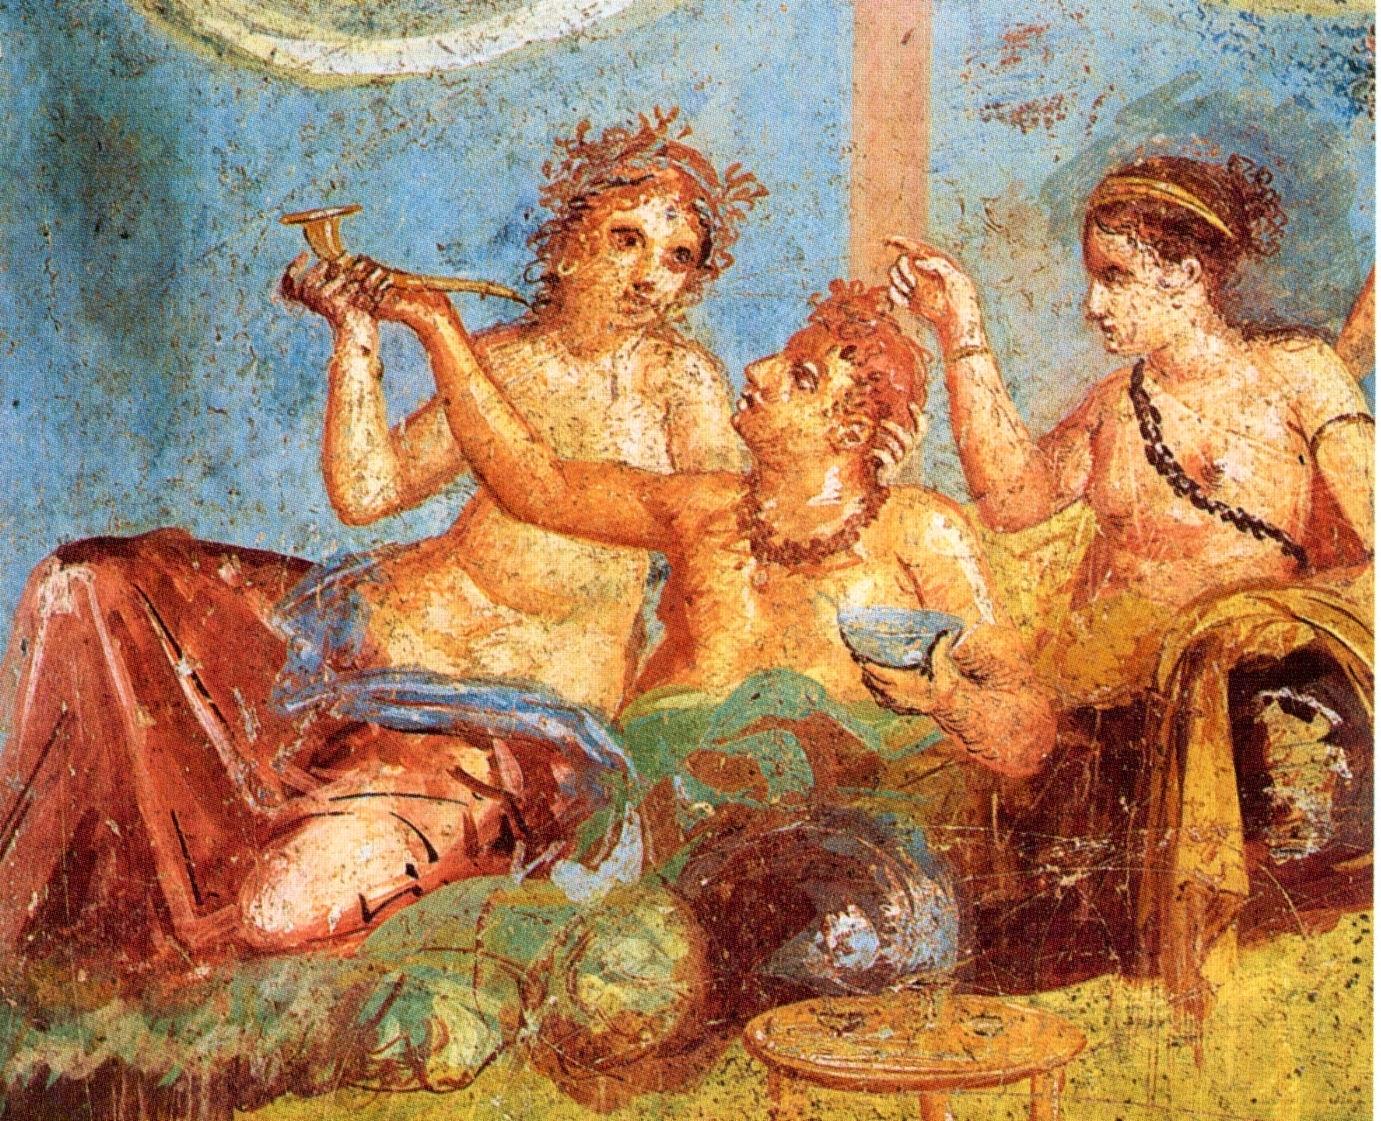 Roman banquet fresco